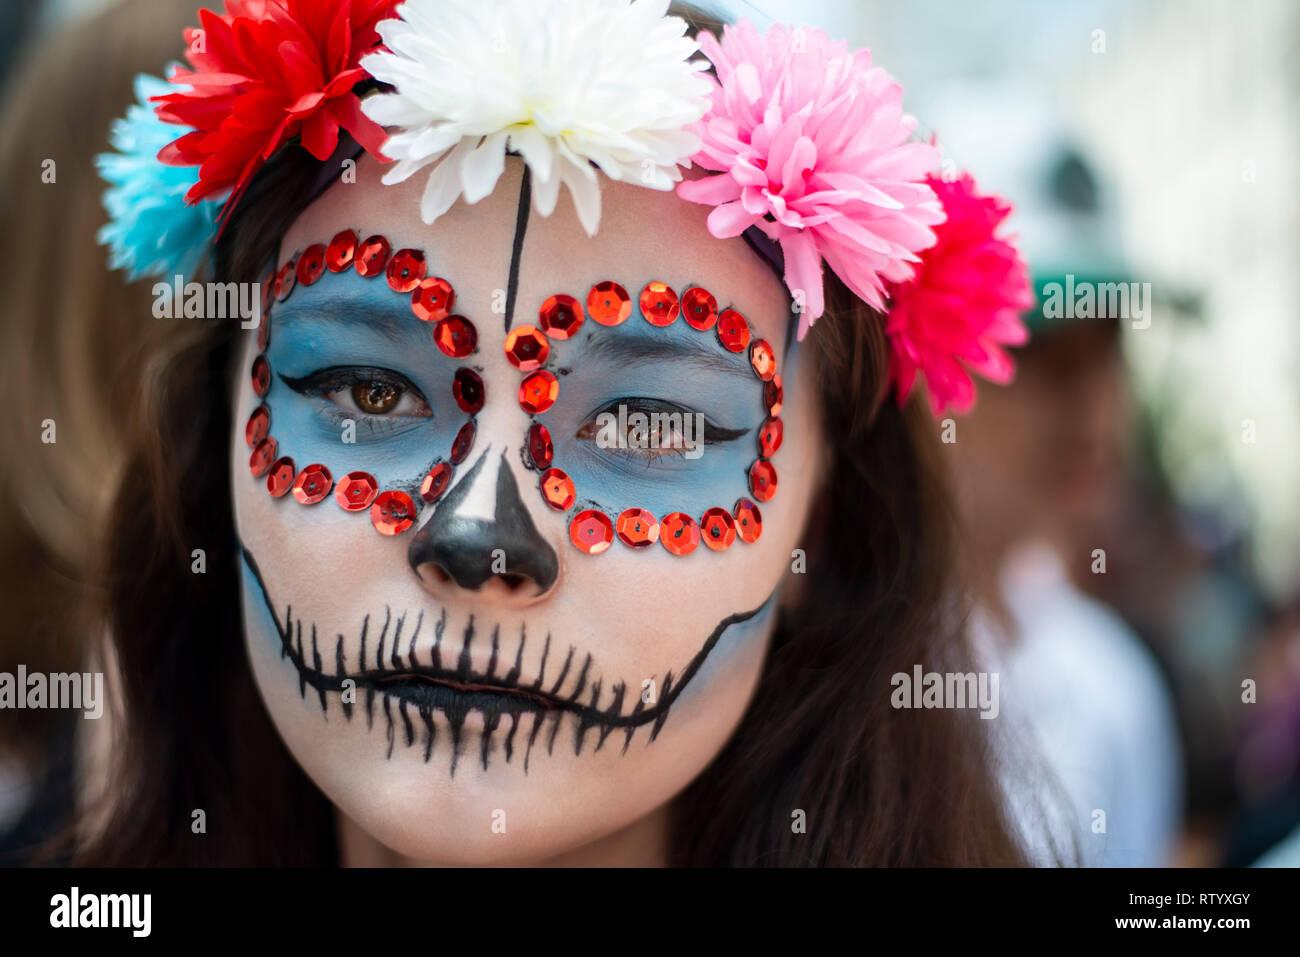 Curitiba, Brazil  03rd Mar, 2019  Participants dressed as